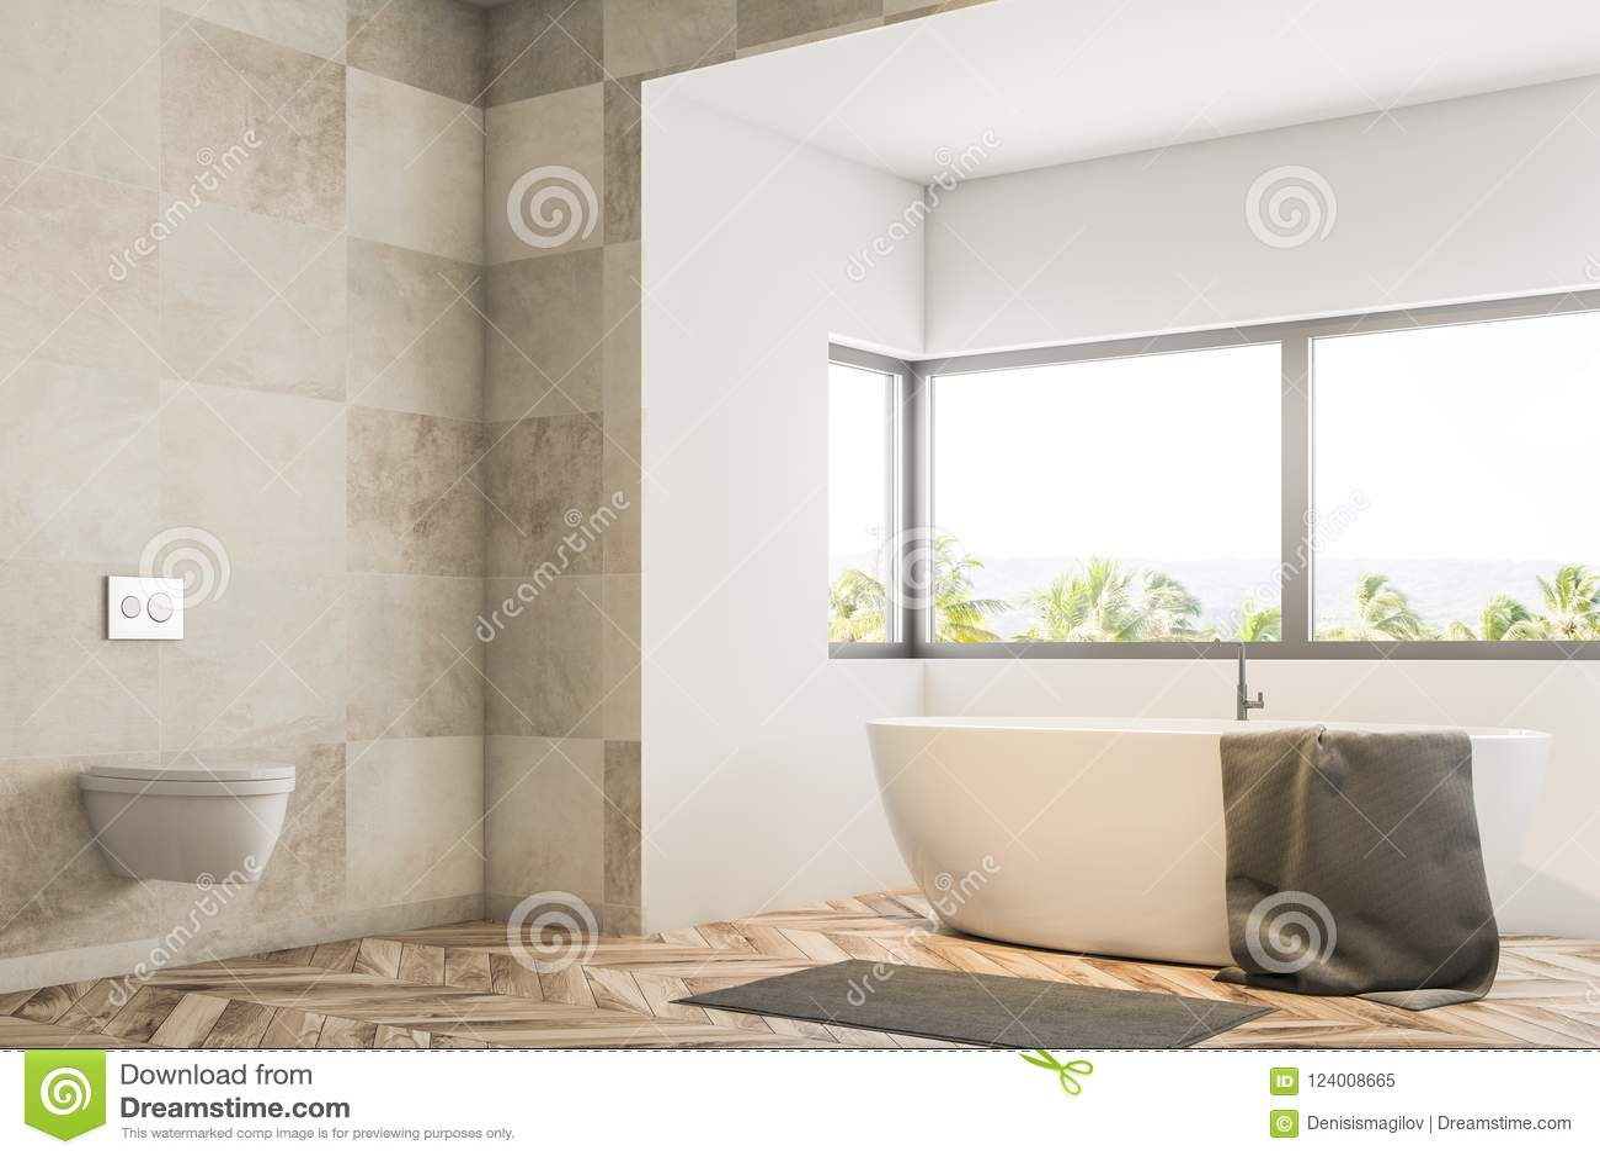 White Tile Bathroom Corner, Tub And Sink Stock Illustration ...